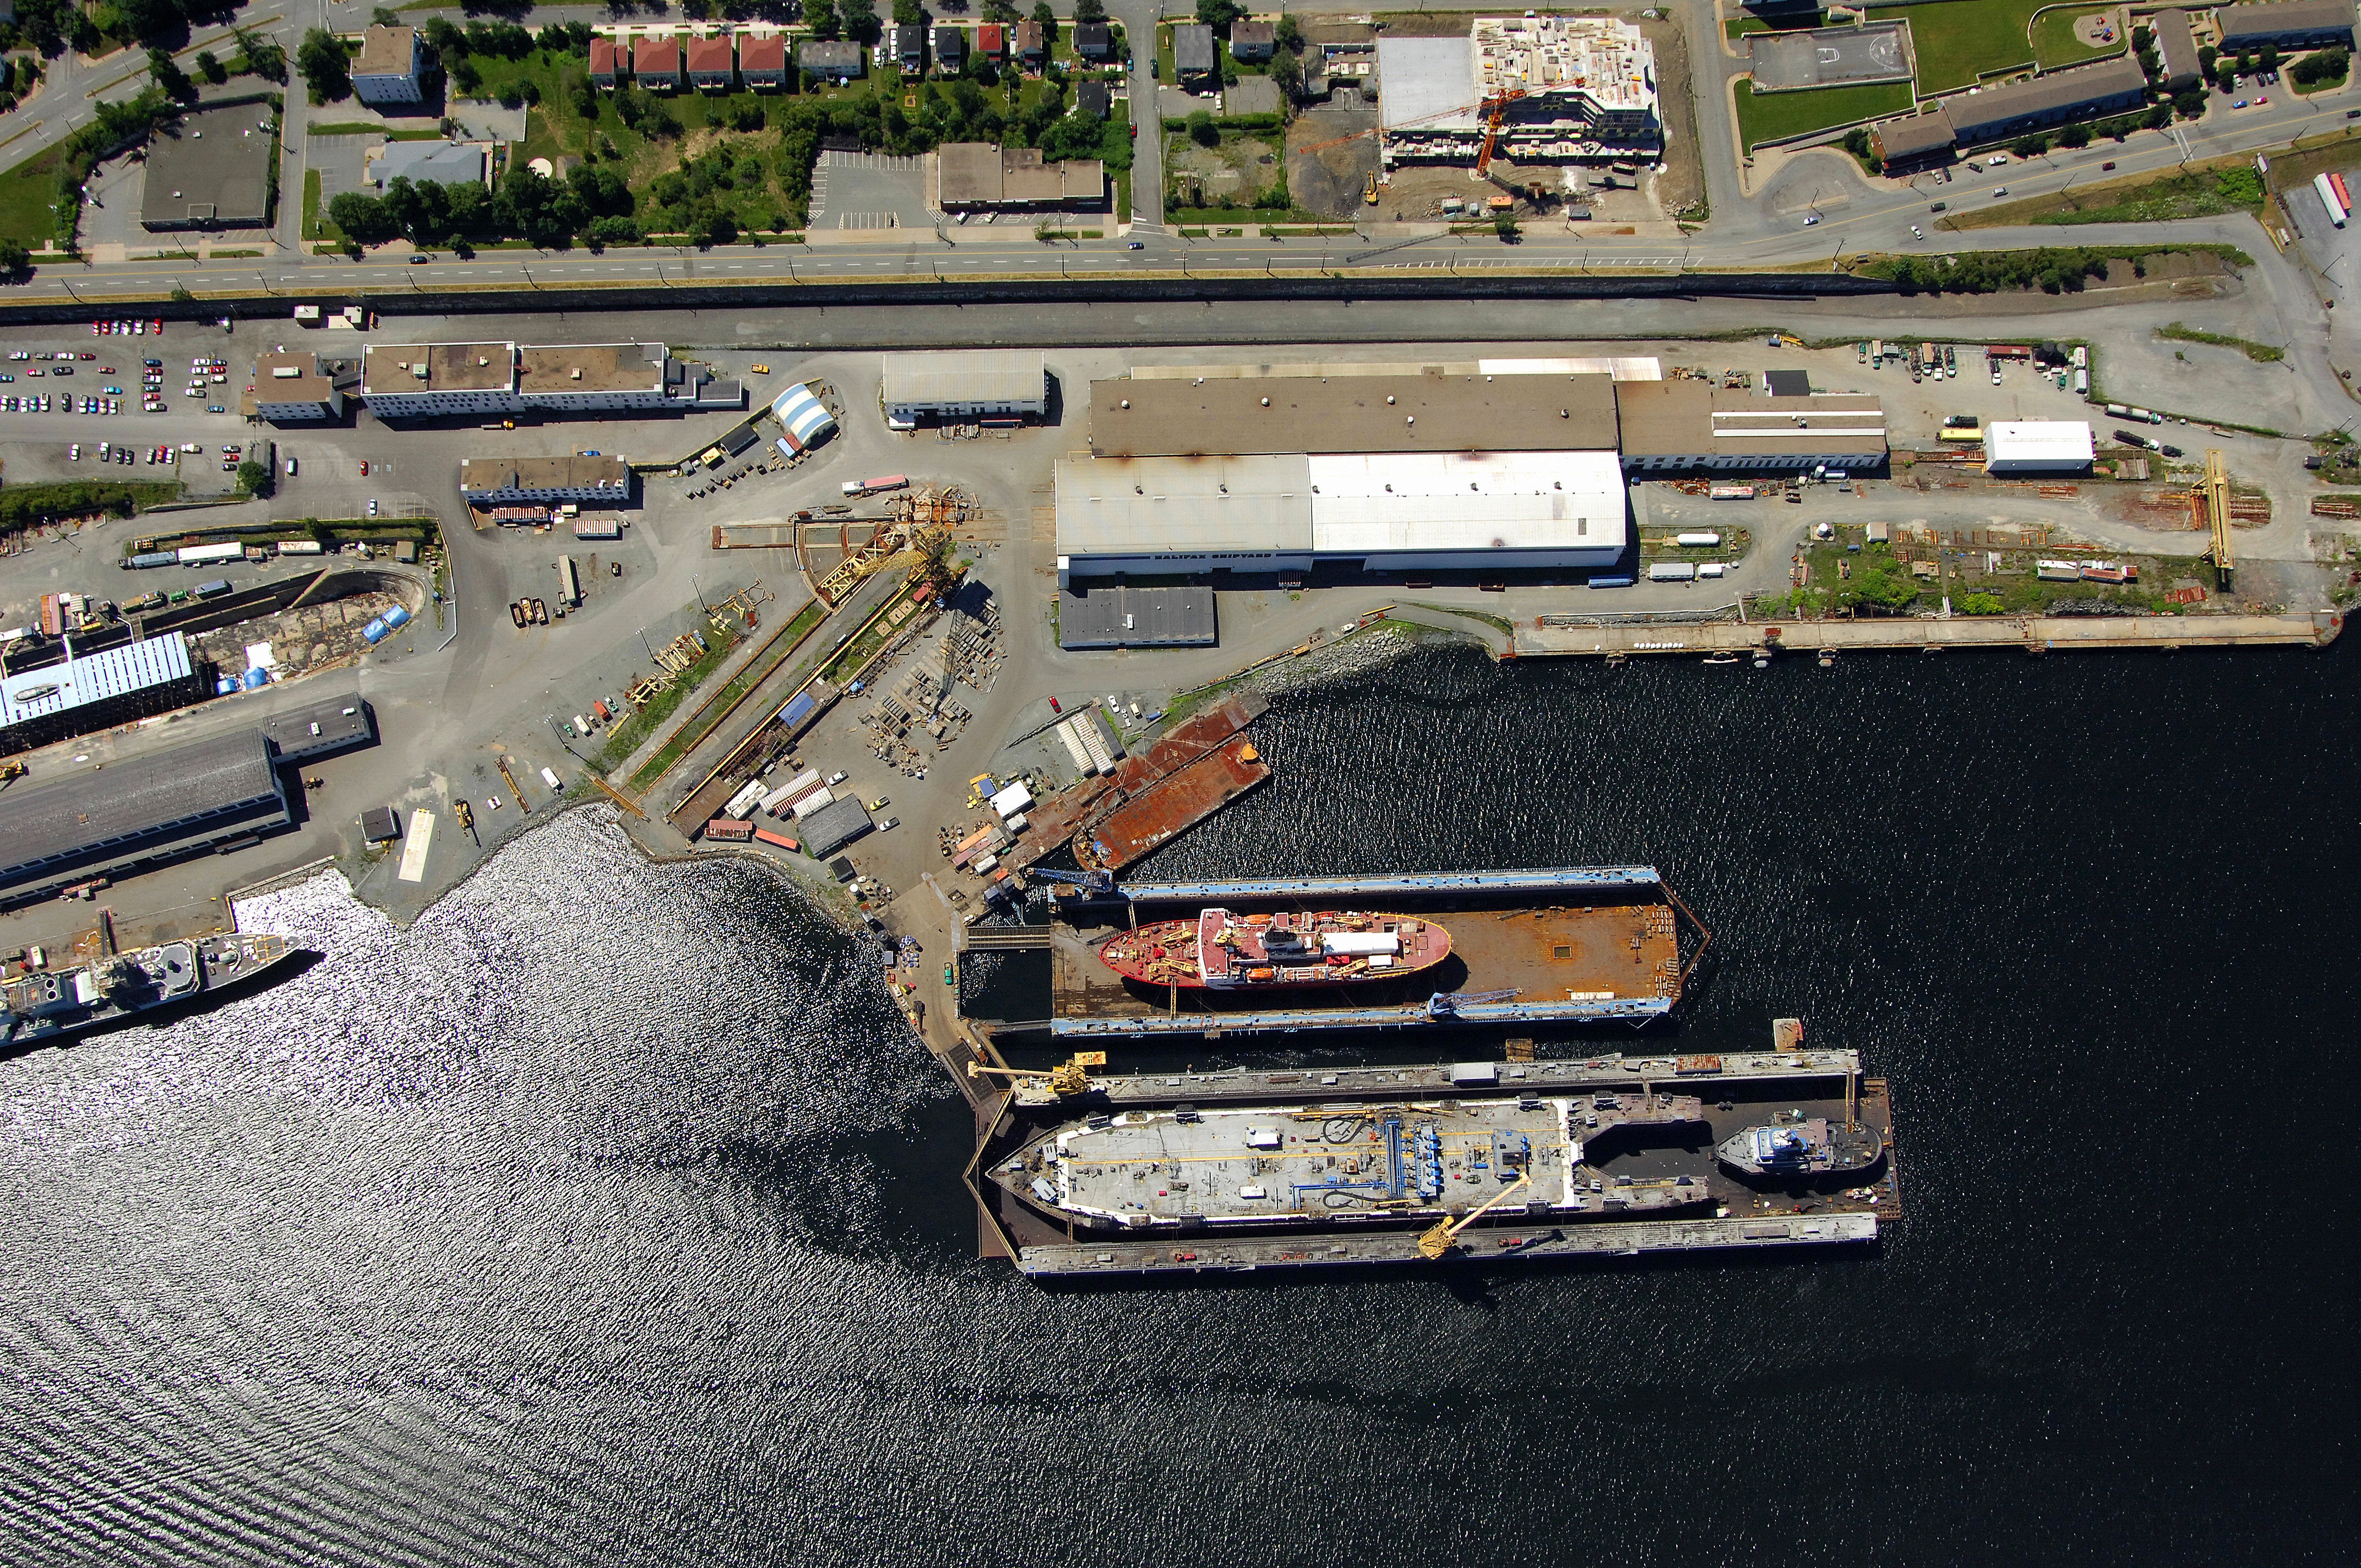 Halifax Shipyard in Halifax, NS, Canada - Marina Reviews